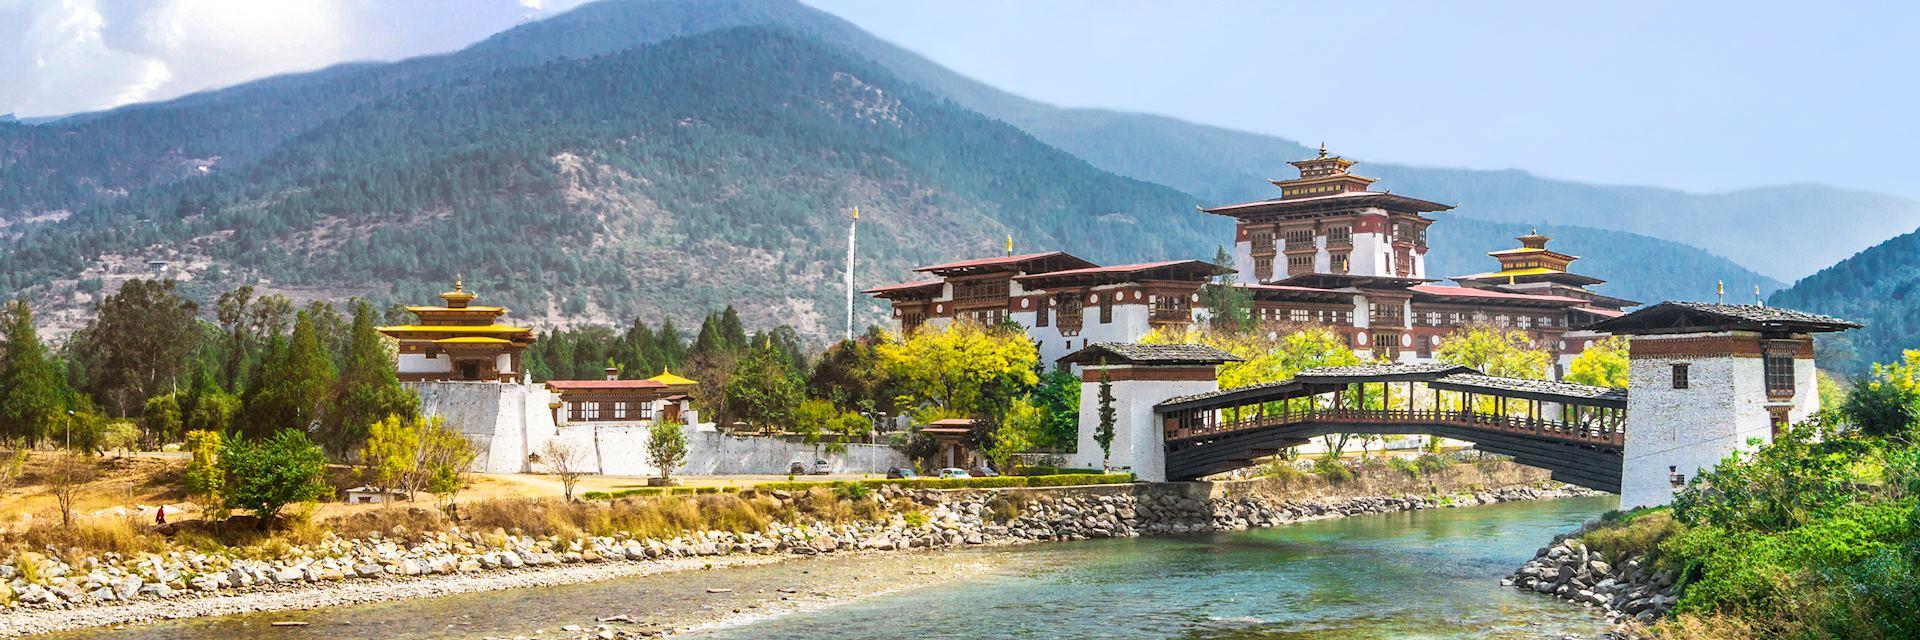 Dzong Monastery, Punakha